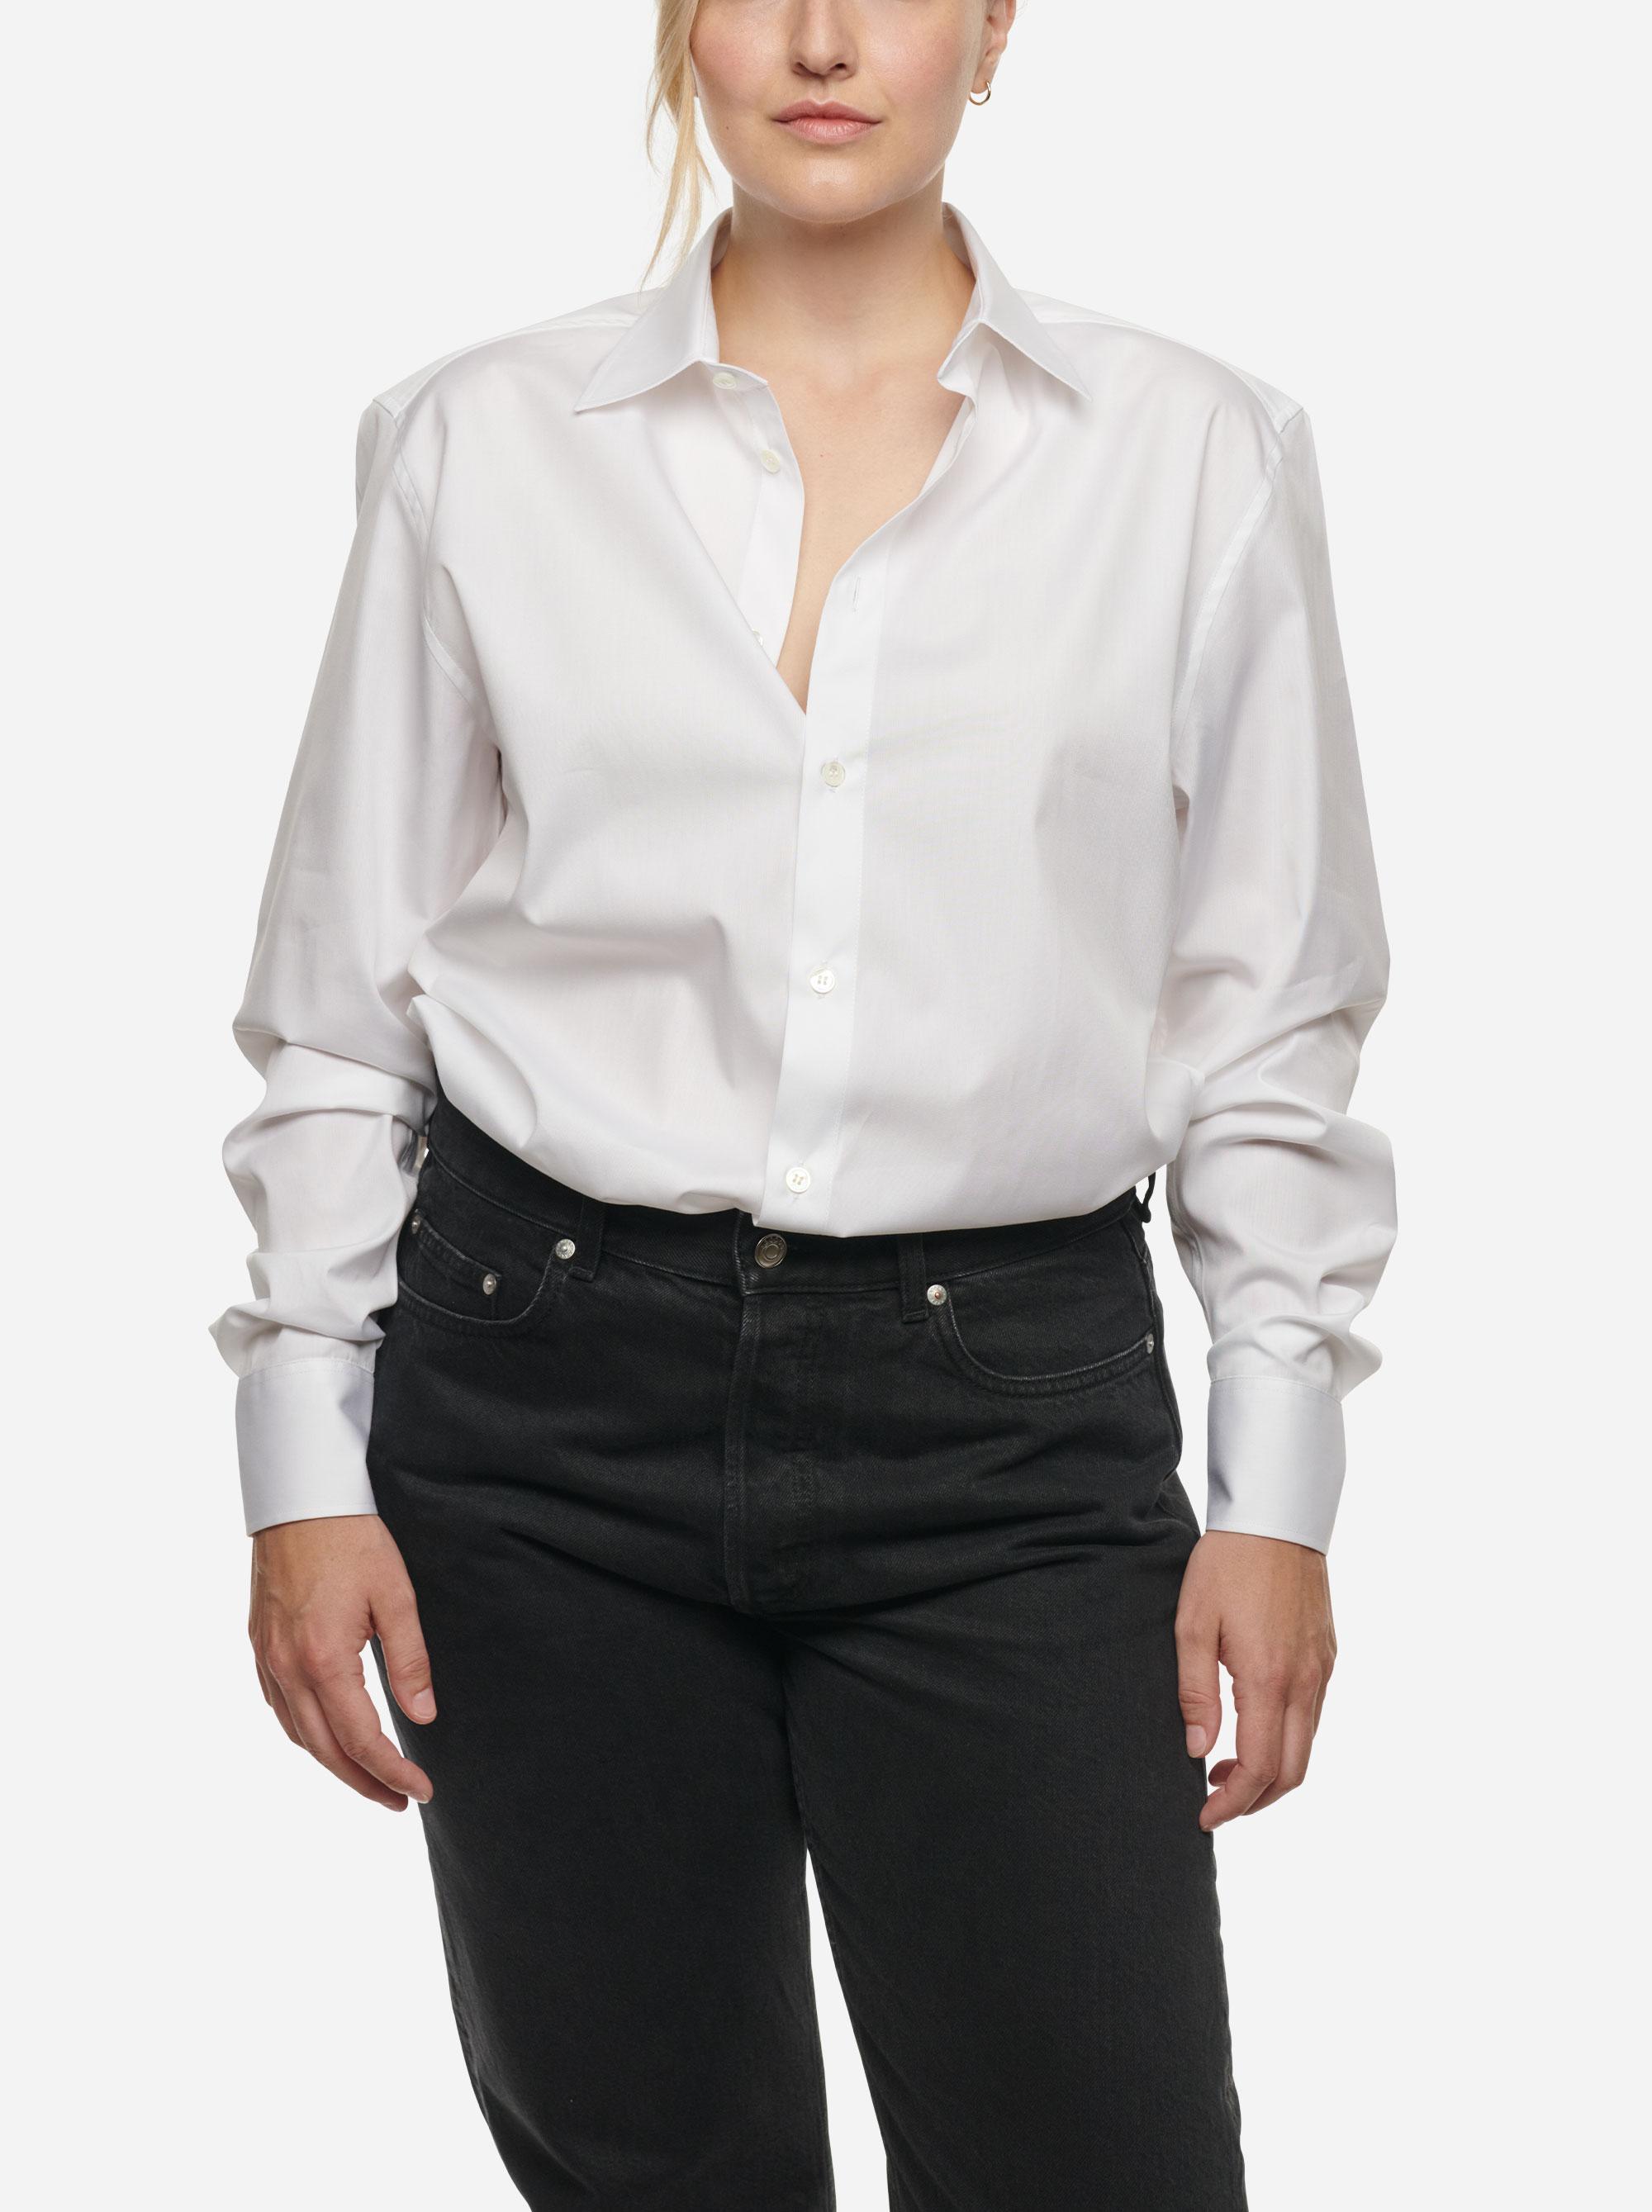 Shirt_Men's_On_Women_Sizeguide_1